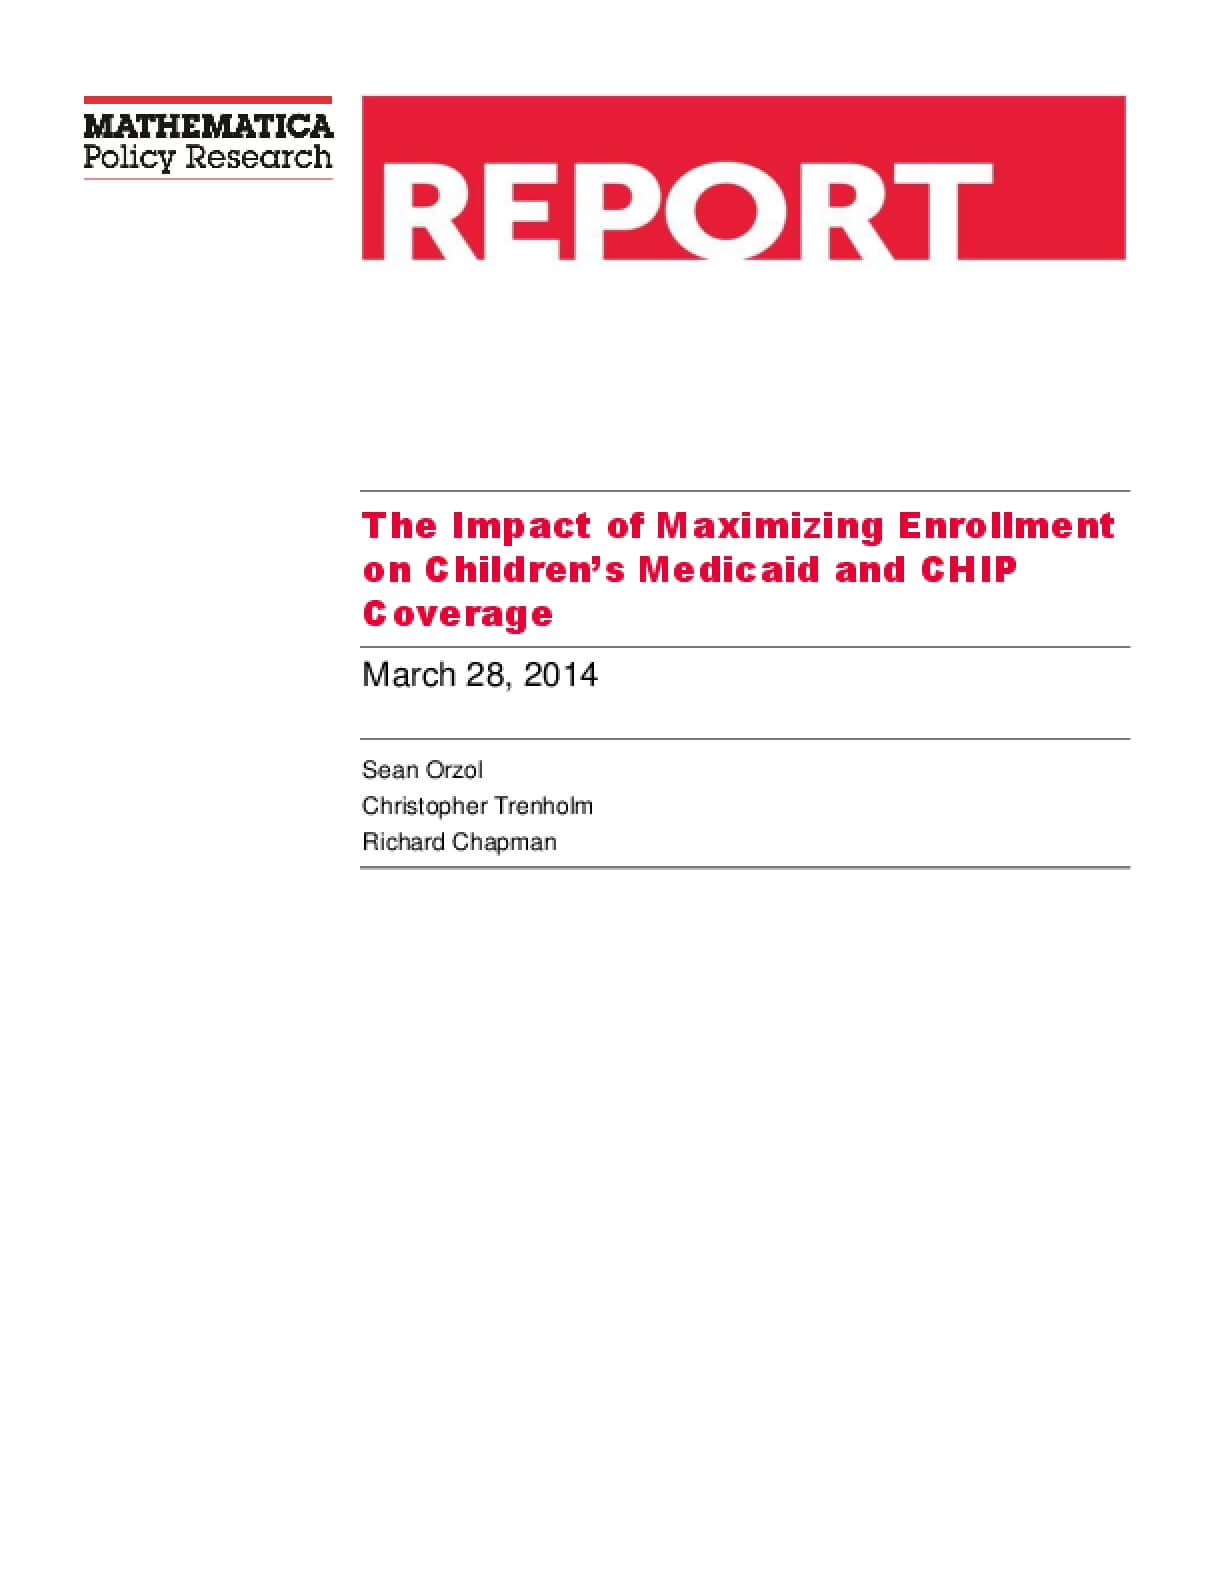 Evaluation of Maximizing Enrollment